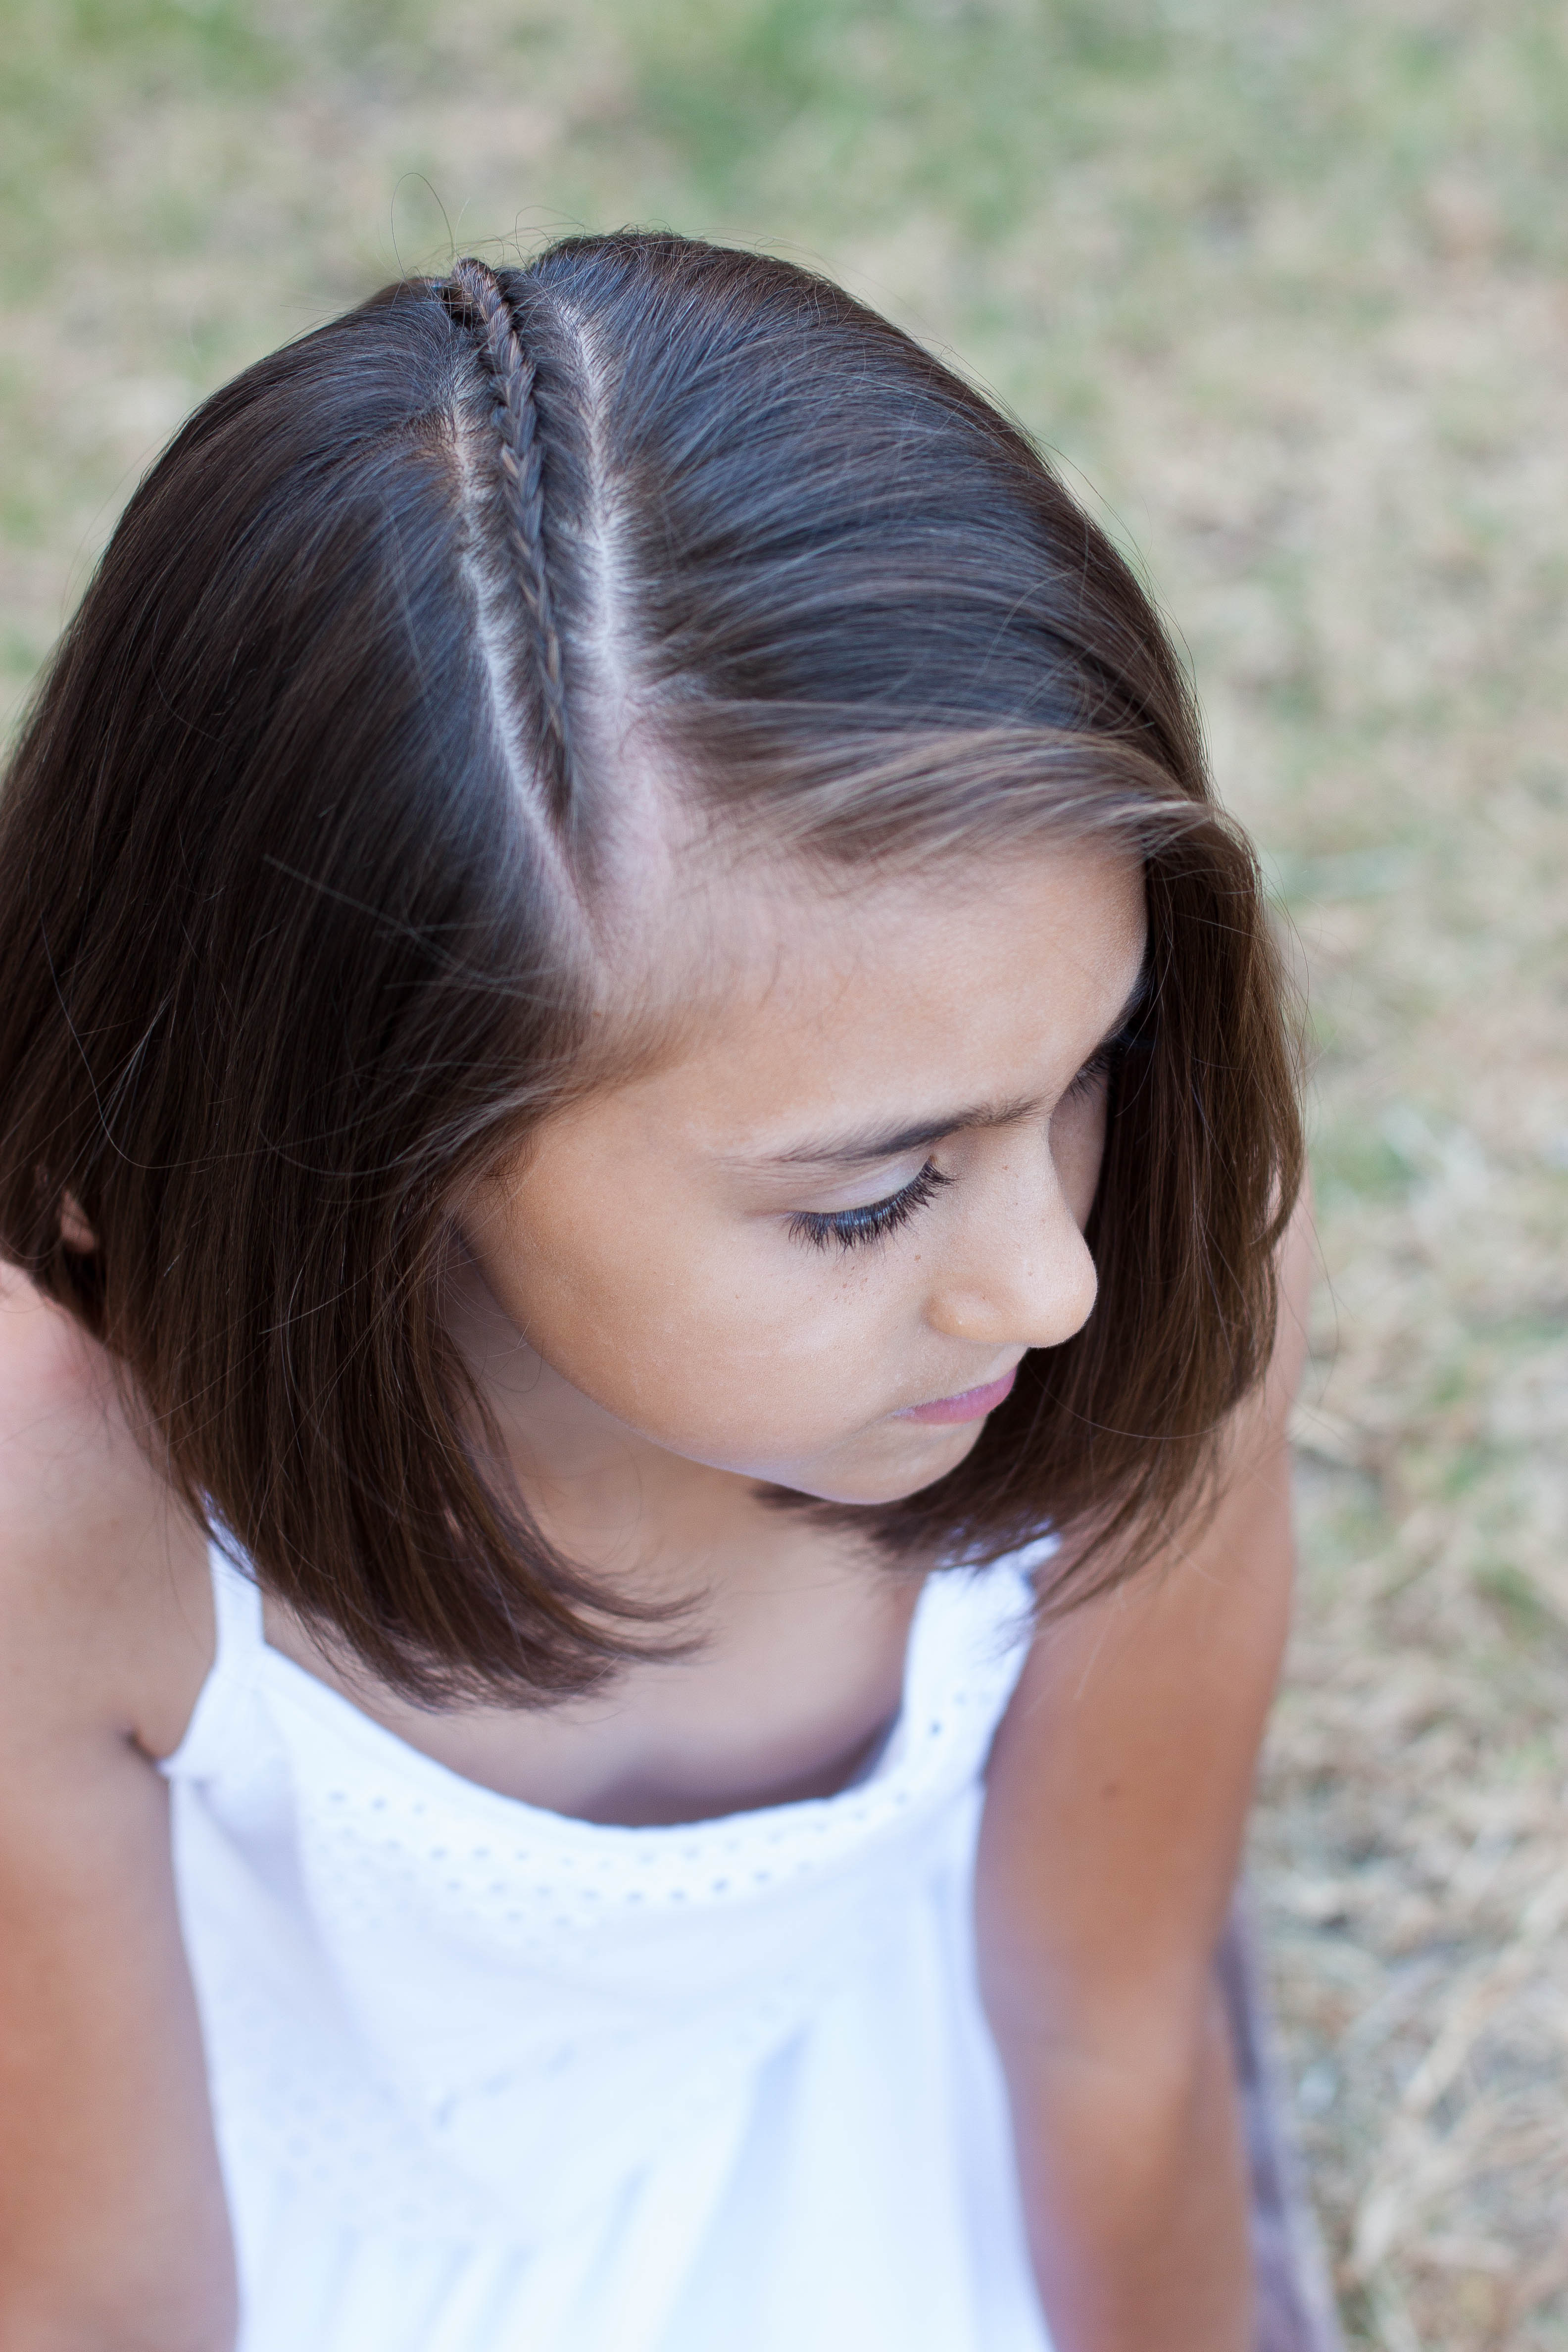 5 Braids For Short Hair | Cute Girls Hairstyles With Cute Hairstyles For Girls With Short Hair (View 8 of 25)